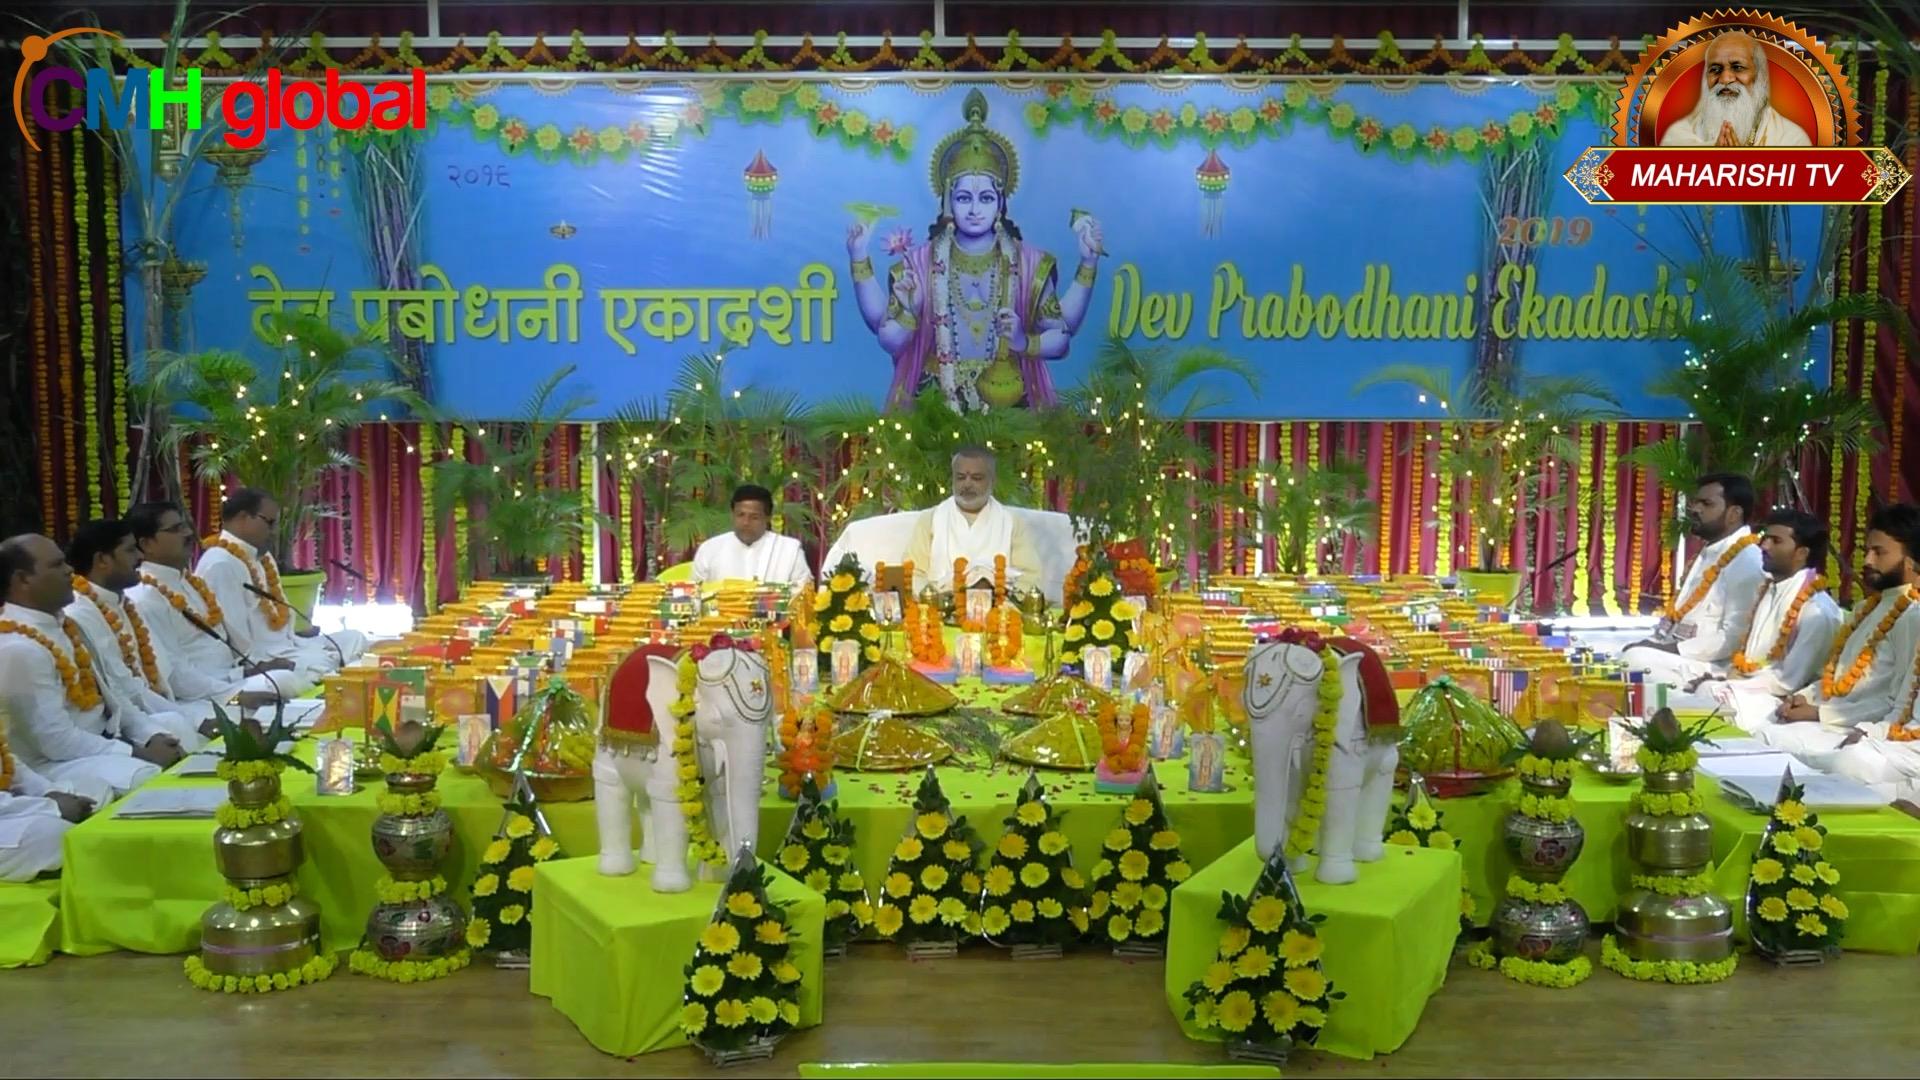 Dev Prabodhani Ekadashi Pujan Ep-01, 2019